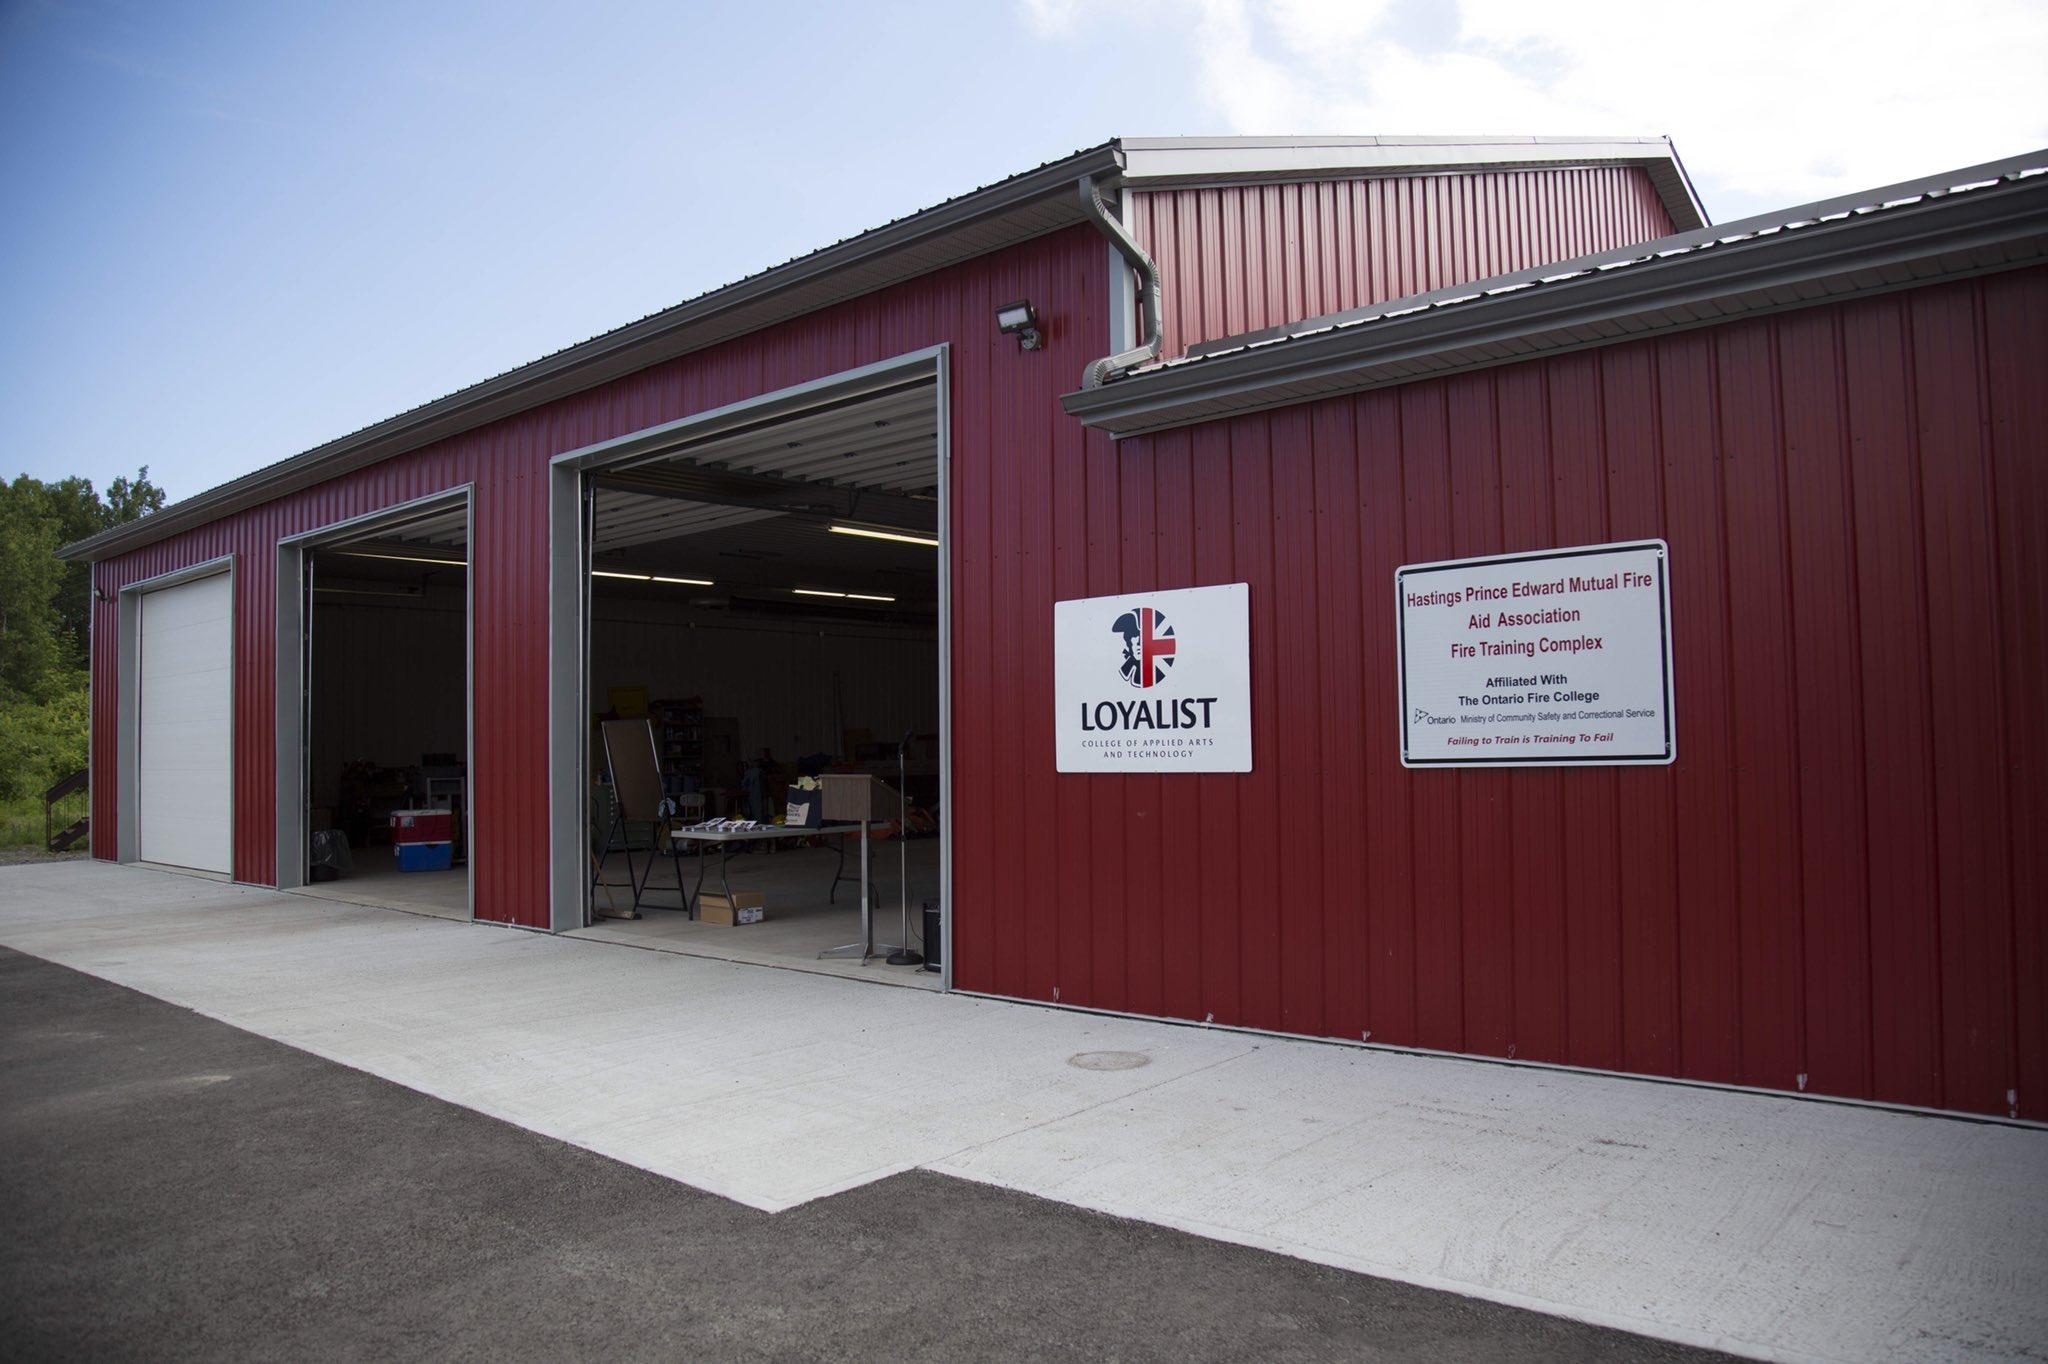 Loyalist College On Twitter Loyalist College Introduces Fire Service Career Preparation And Development Program Visit Https T Co Lpe8zahw60 For Details Quintewest Https T Co 9hniwiyh8d